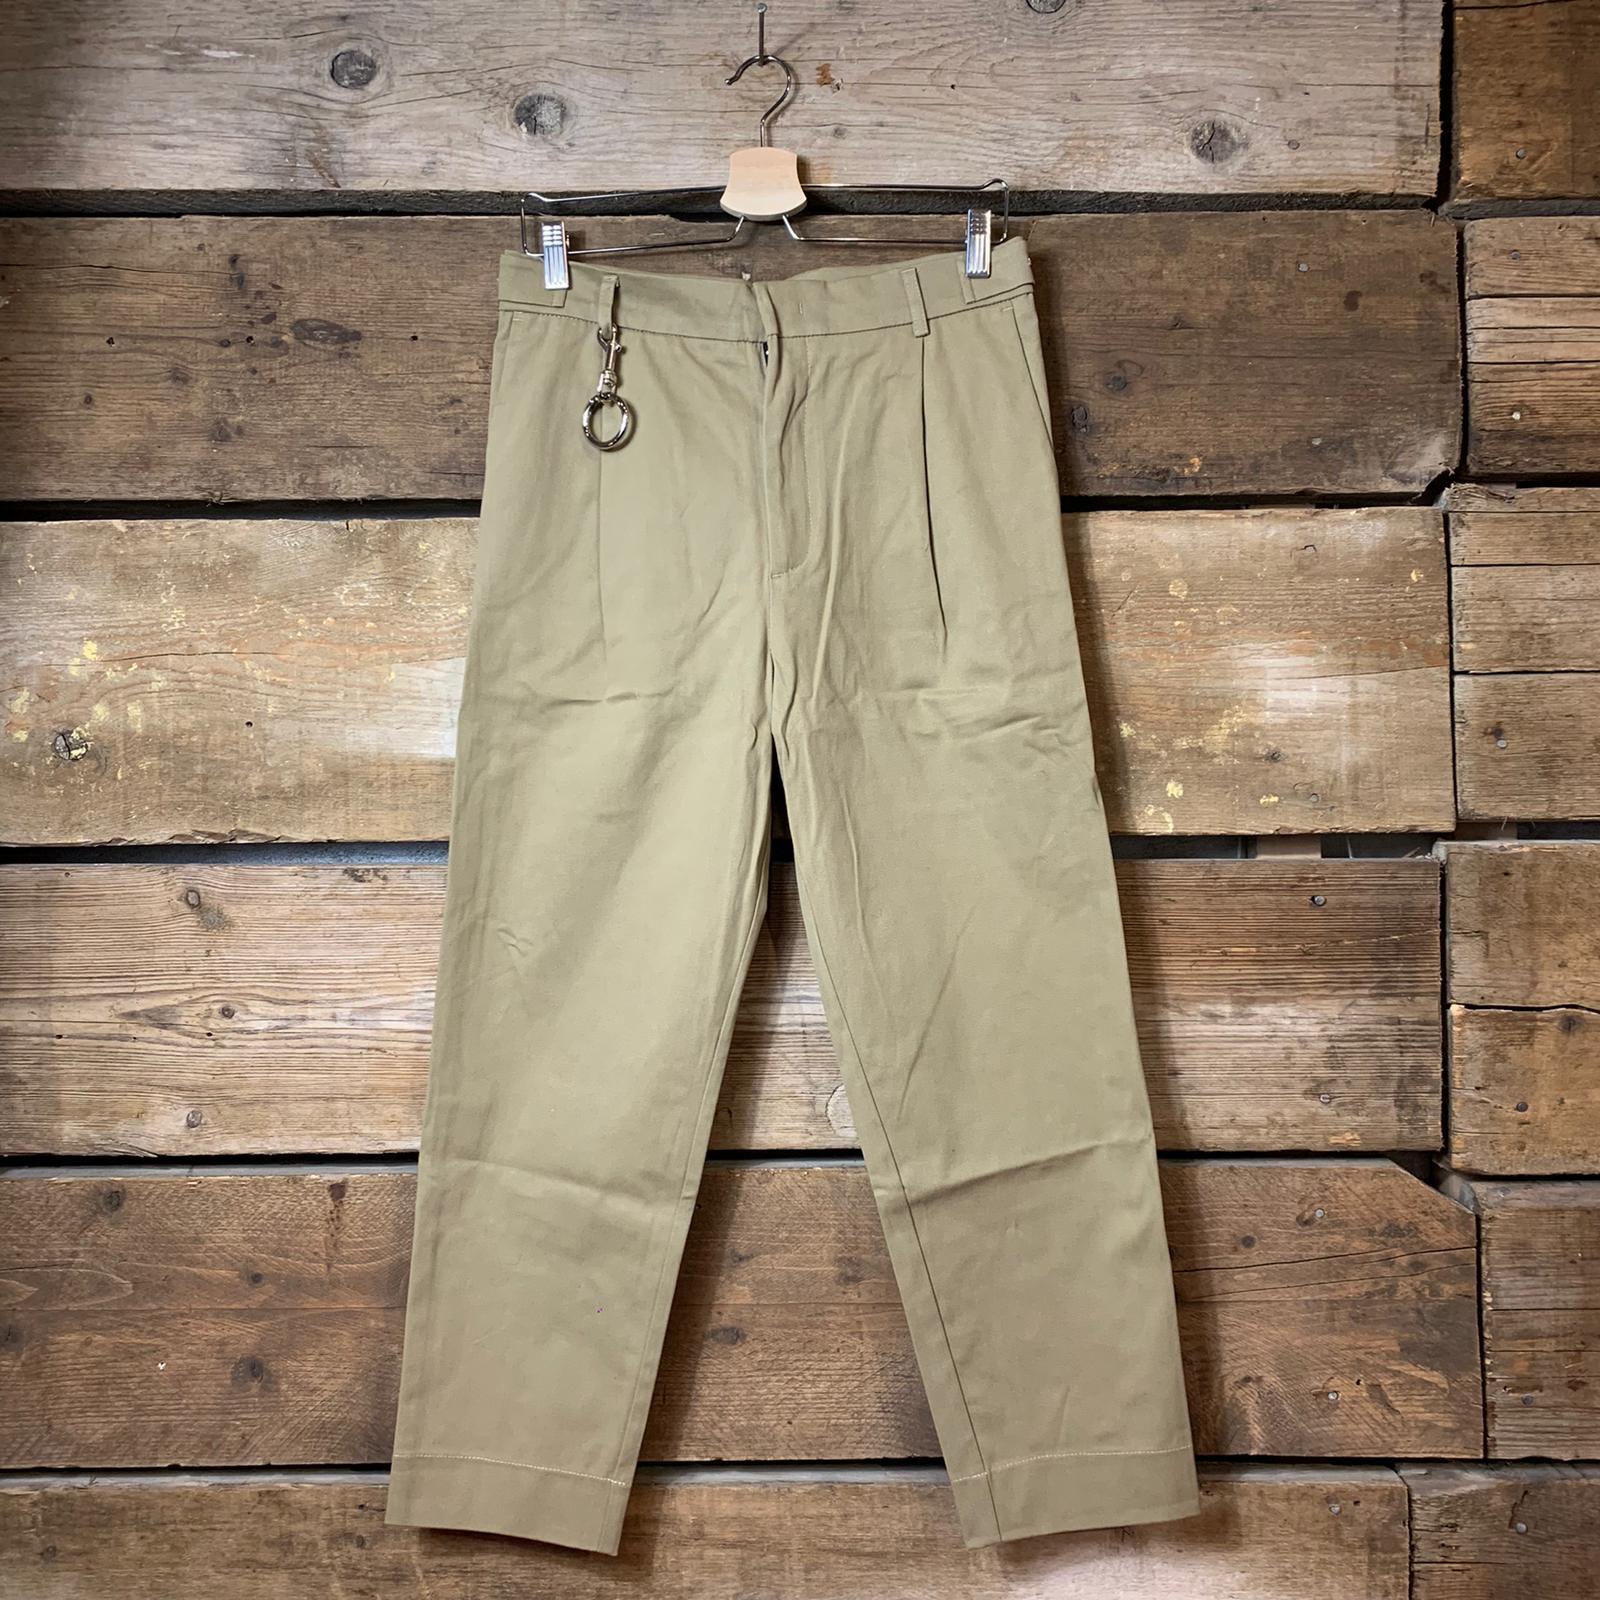 Pantalone Sike Gabardine Beige